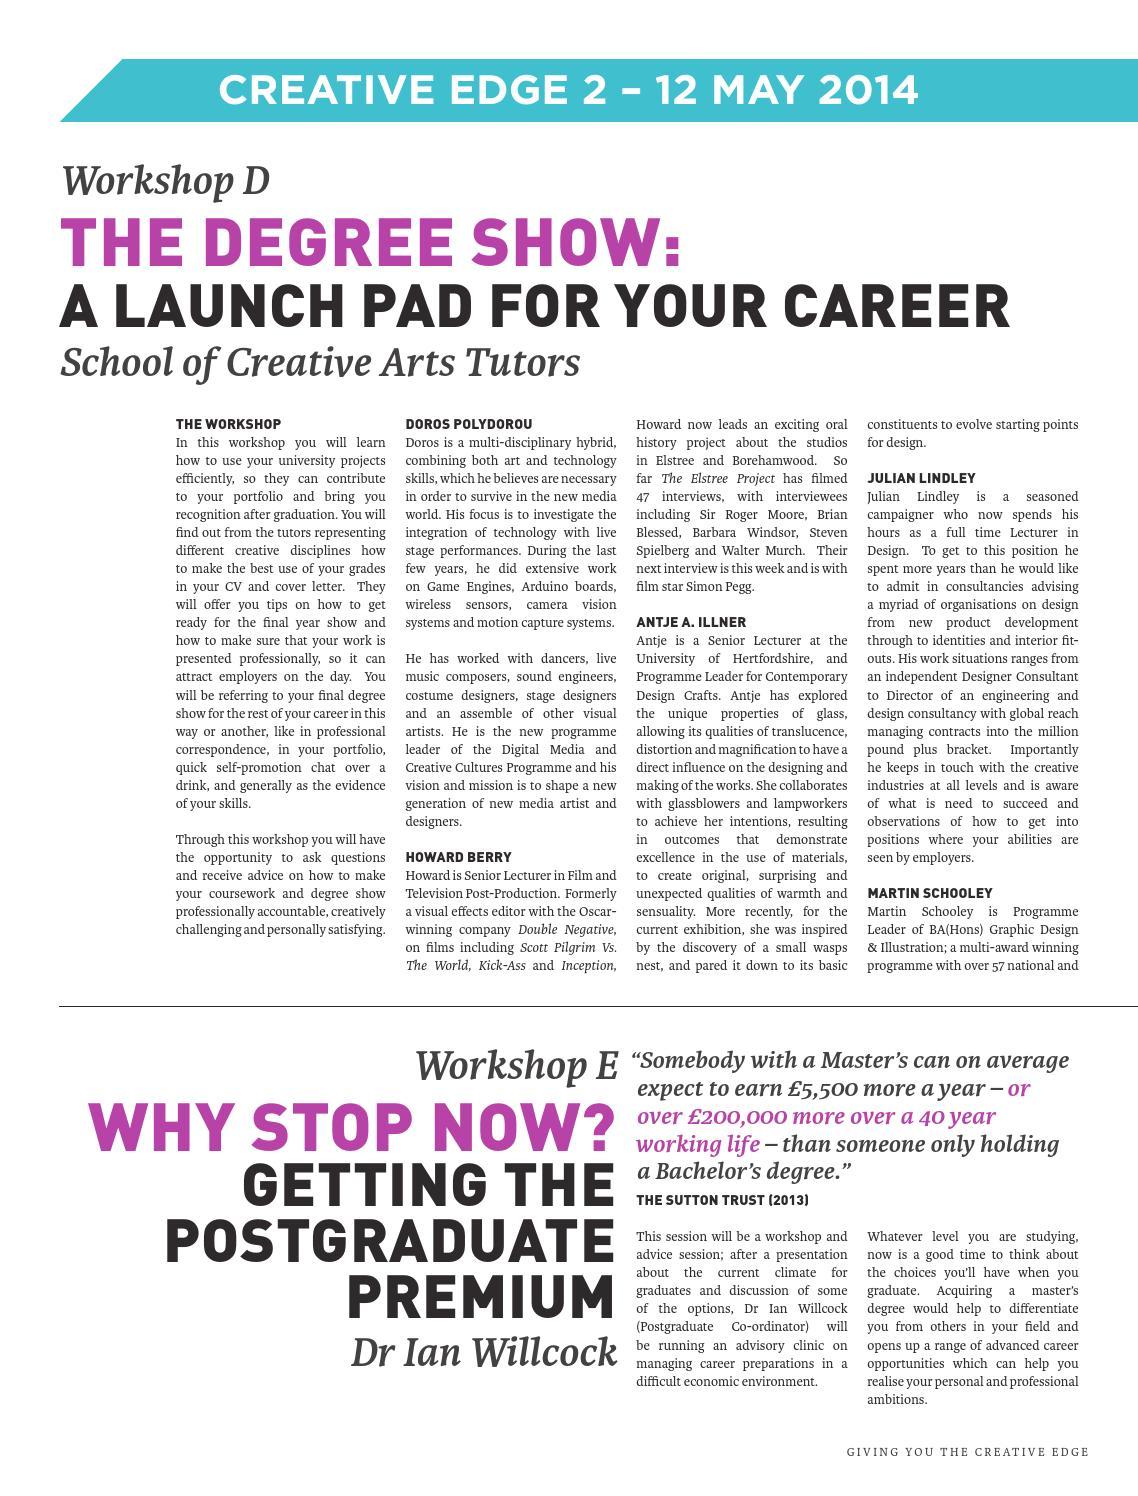 University of Hertfordshire School of Creative Arts